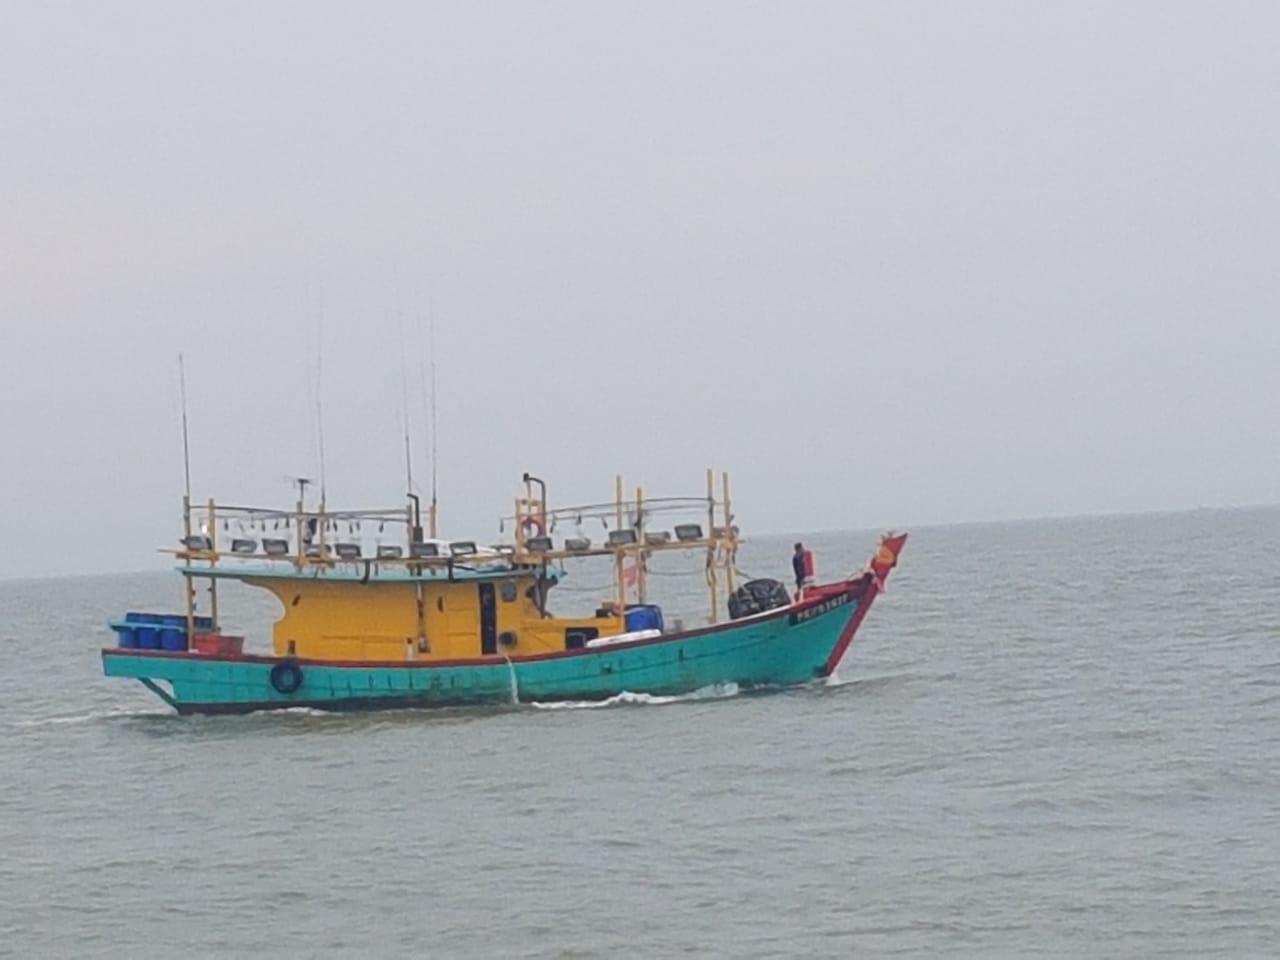 https: img.okezone.com content 2019 07 23 320 2082546 kkp-tangkap-kapal-ilegal-malaysia-di-selat-malaka-OjWsEqHmtm.jpeg